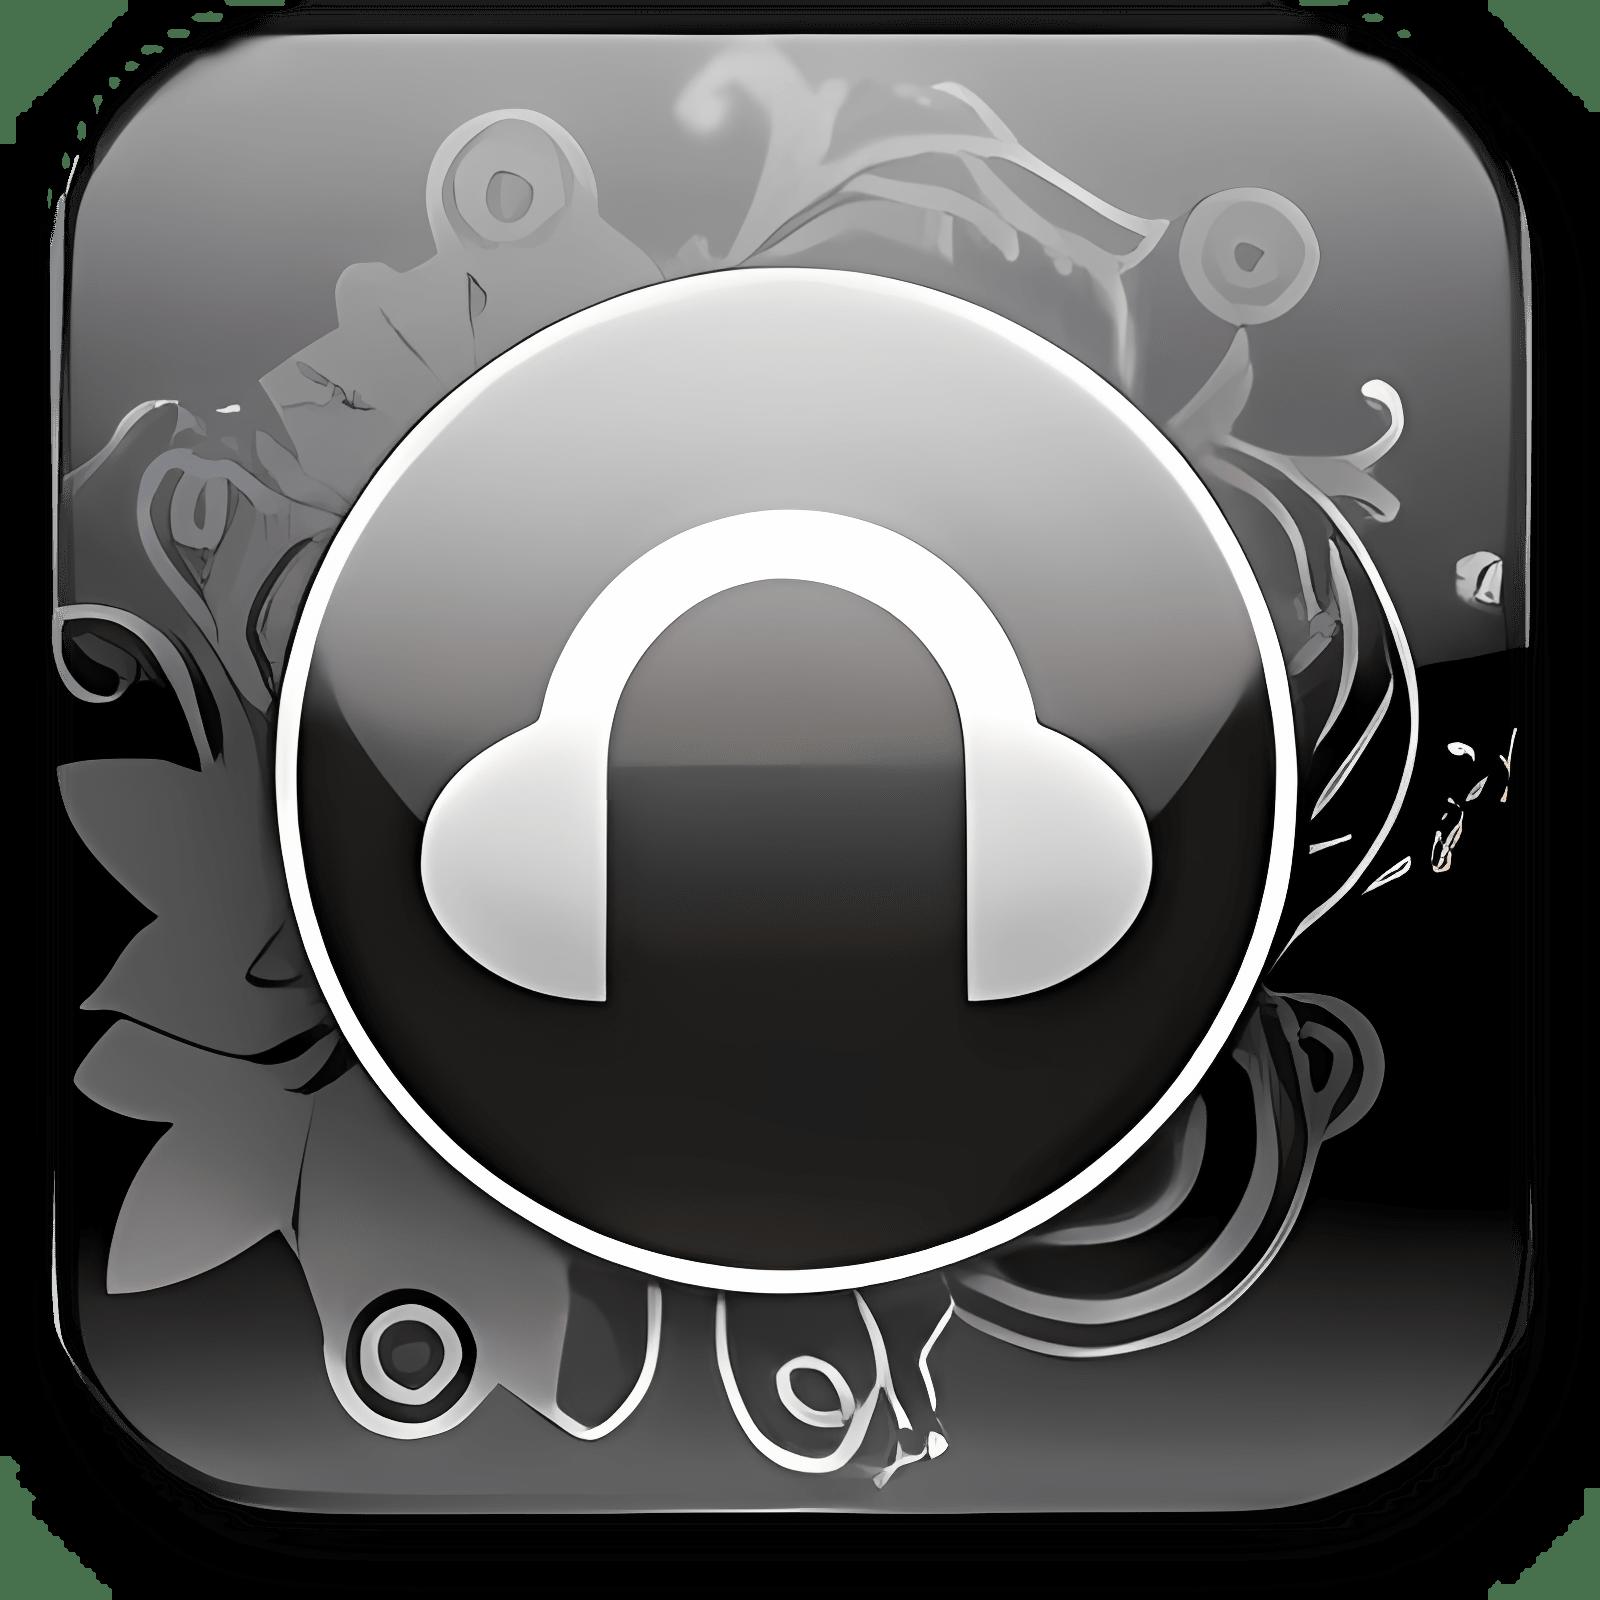 Ringtone (Free Music Download)